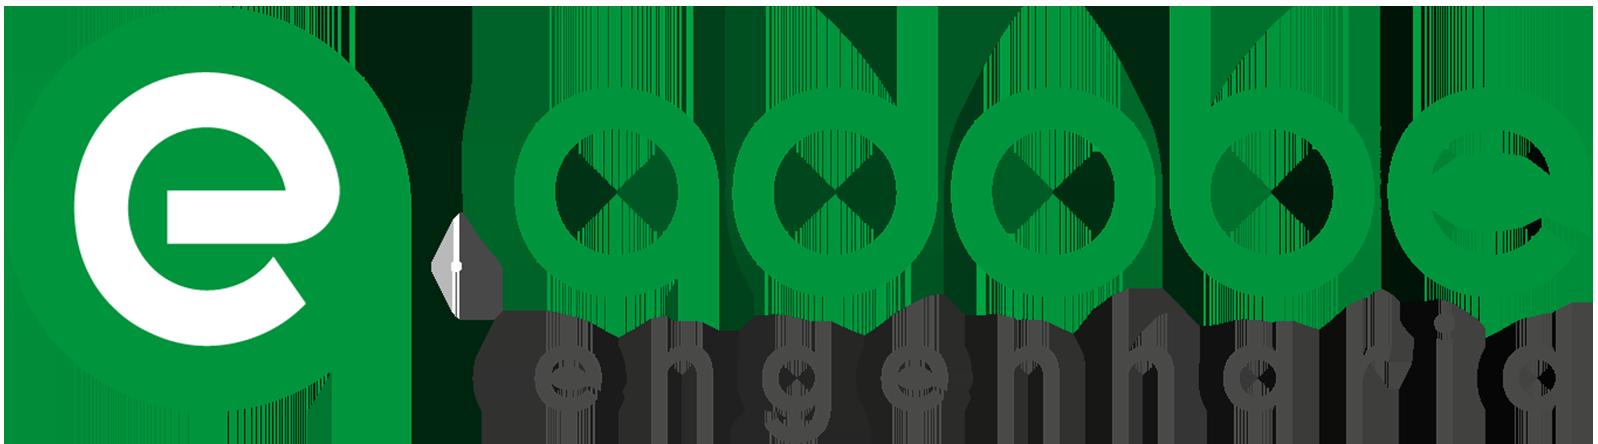 Adobe Engenharia